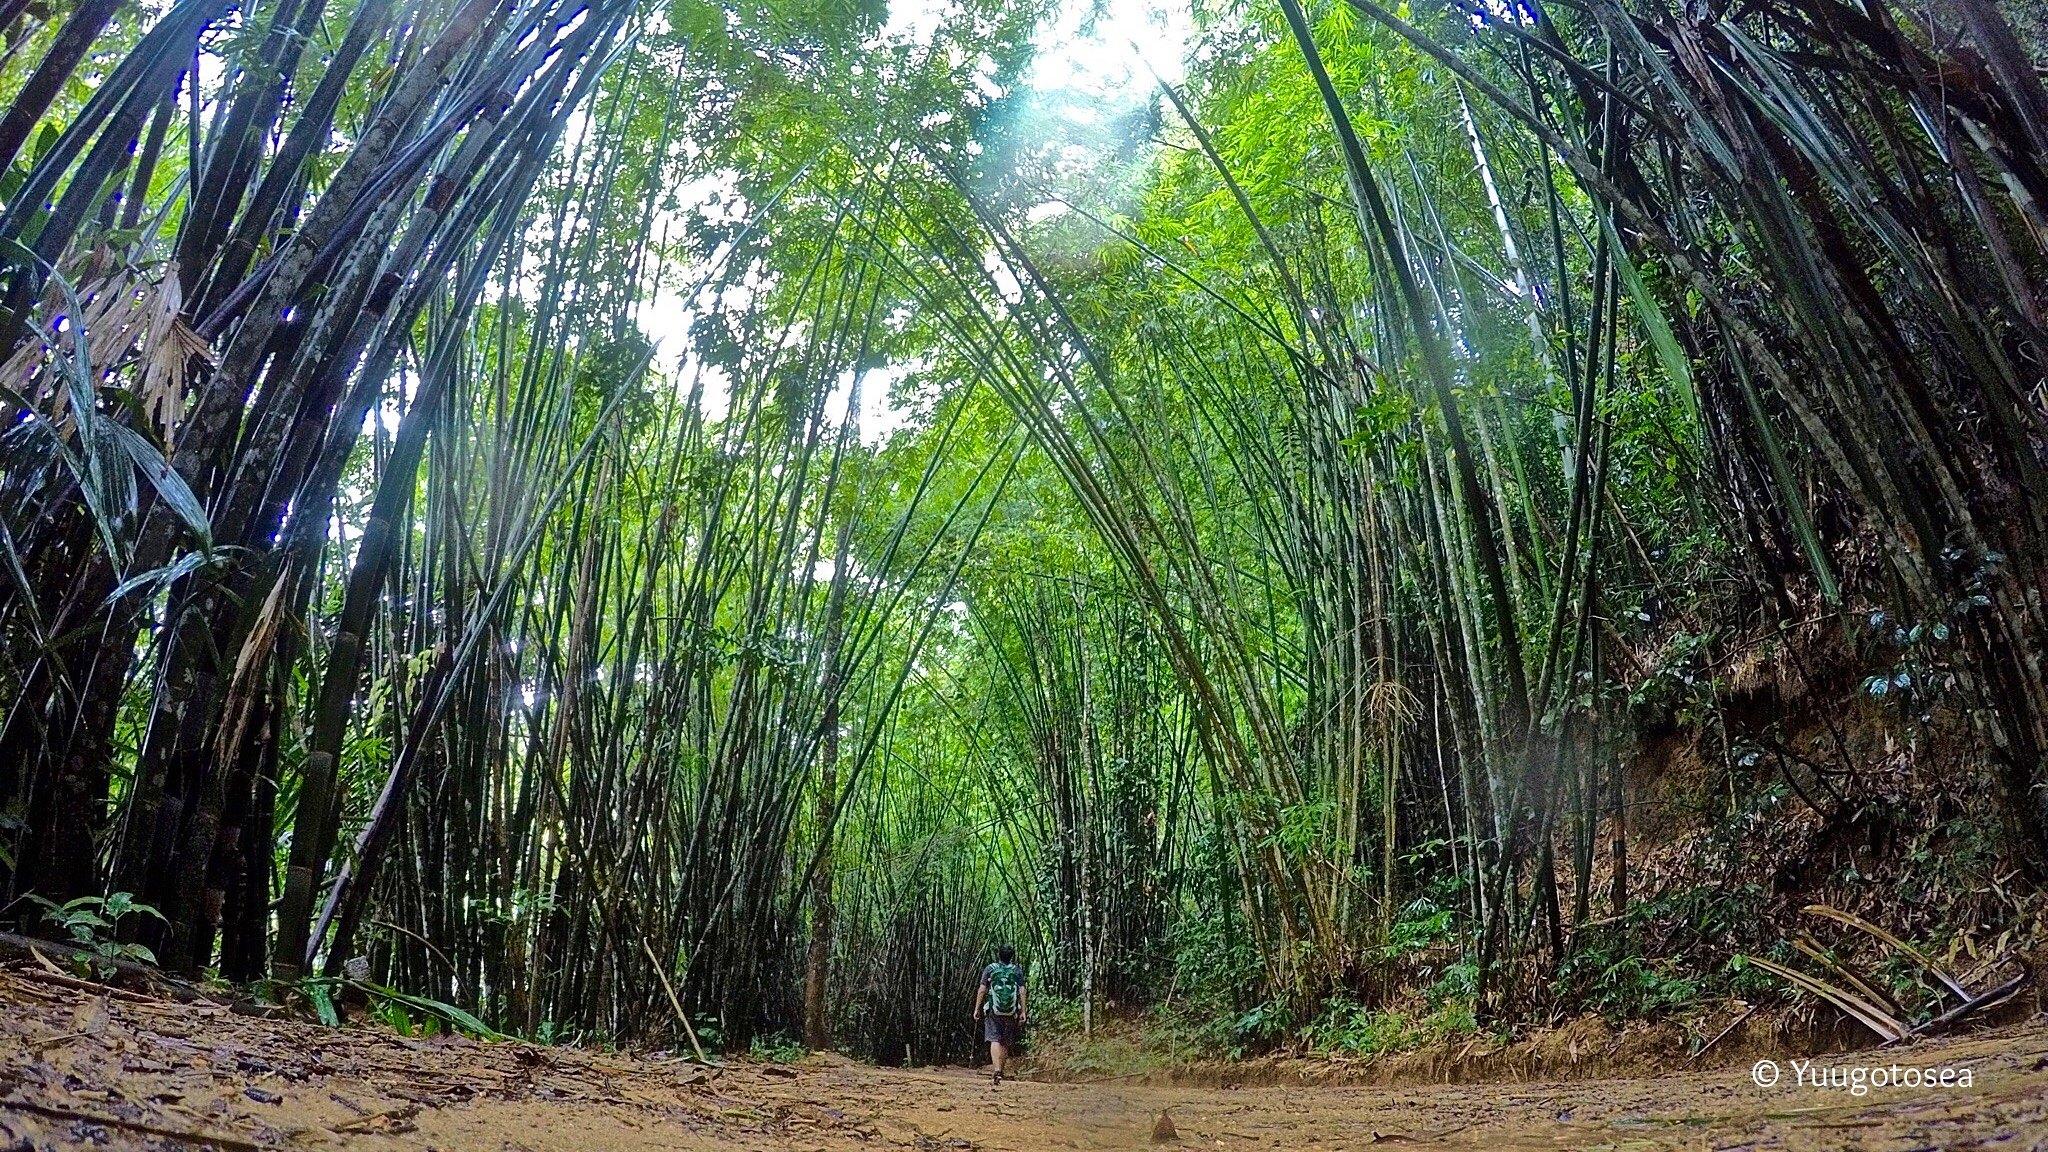 backpacking-thailand---suratthani---hatyai---penang---kuala-lumpur-2015